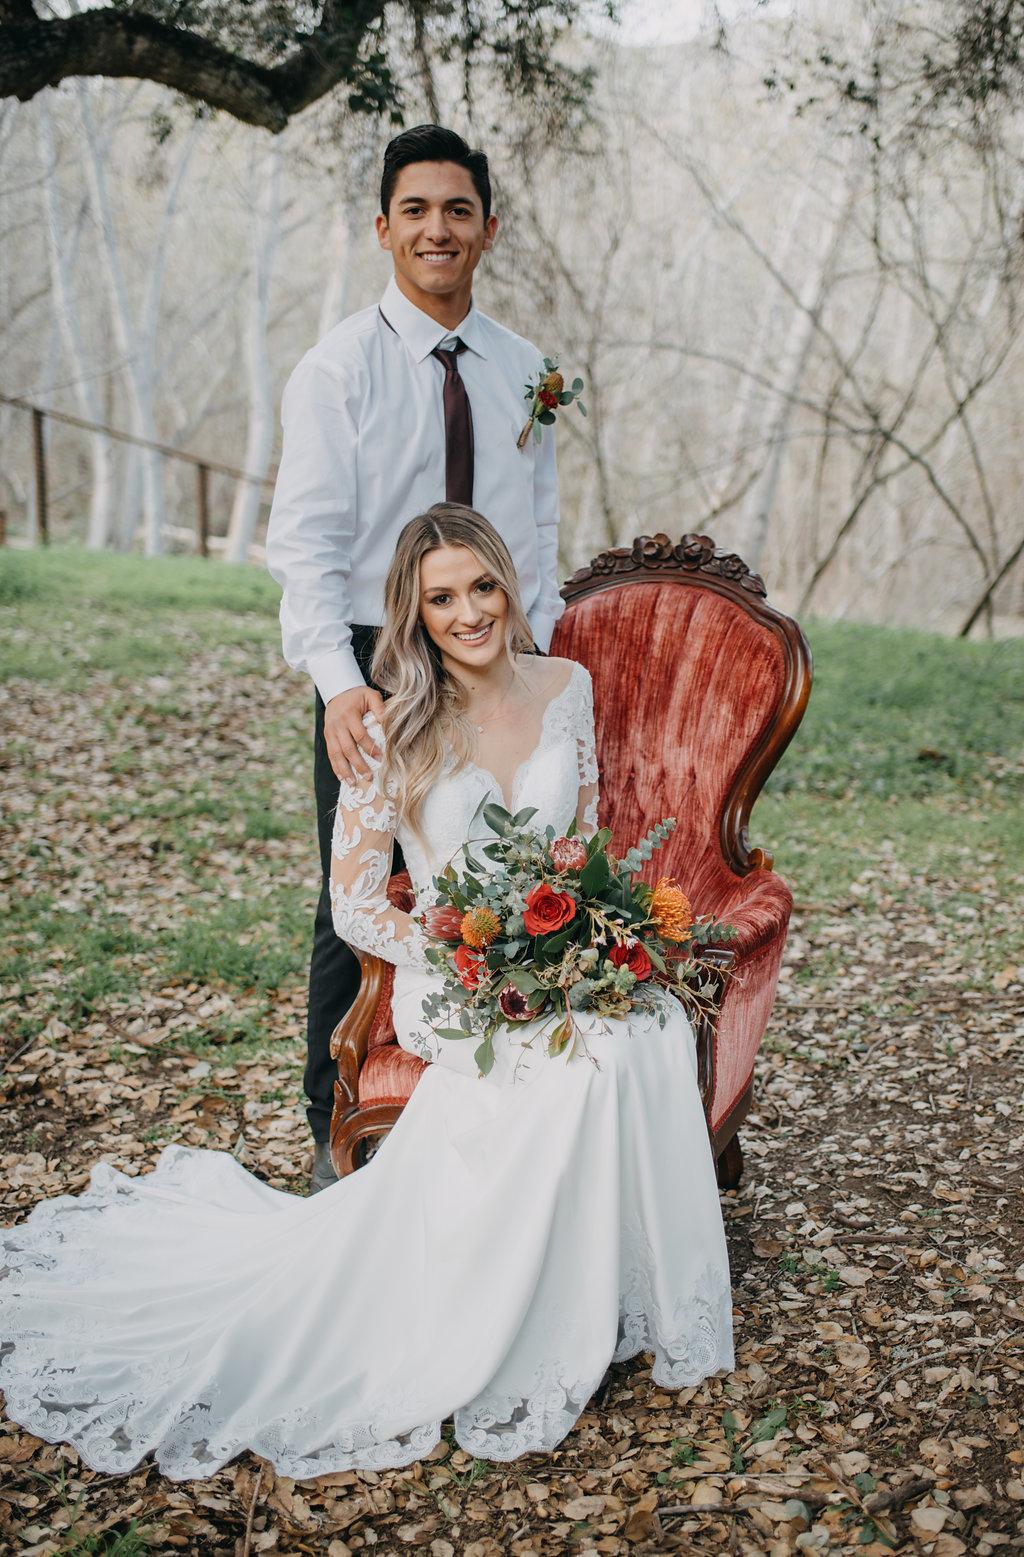 boho wedding photo idea outdoors natural wedding photos red velvet chair seasonal flowers